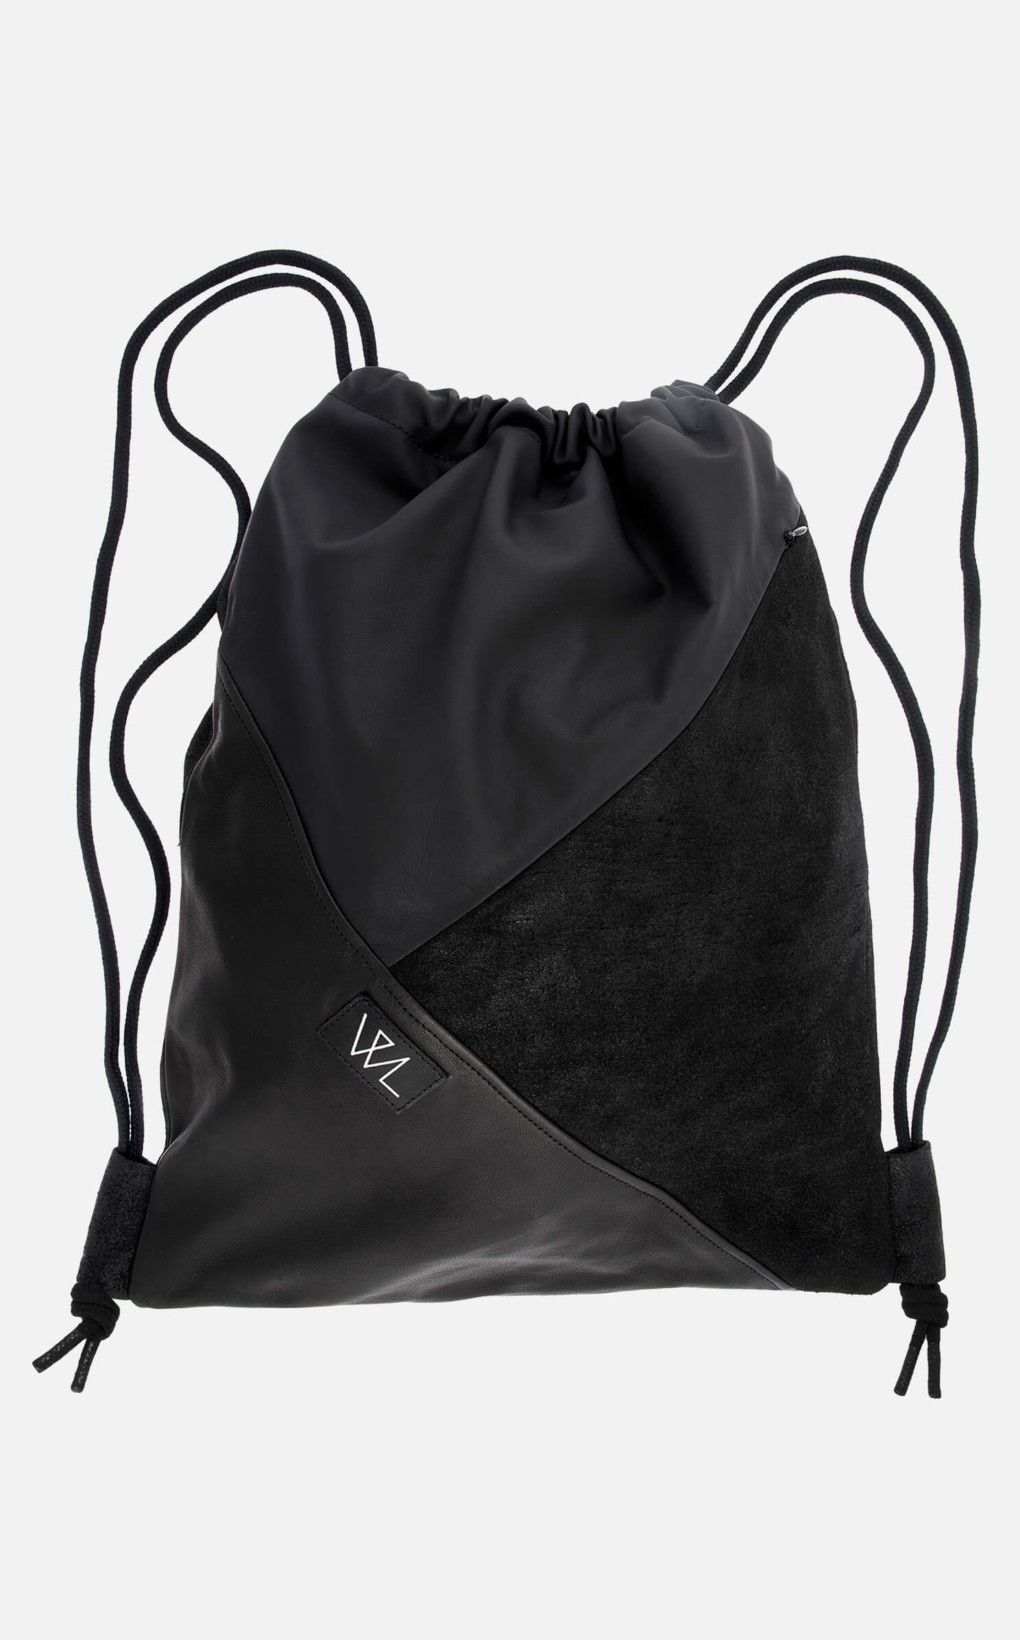 7b66fb03c1b37 ADIDAS Linear Performance Gym Bag Sportbeutel Turnbeutel Schuhbeutel Gymbag  Sporttaschen   Rucksäcke